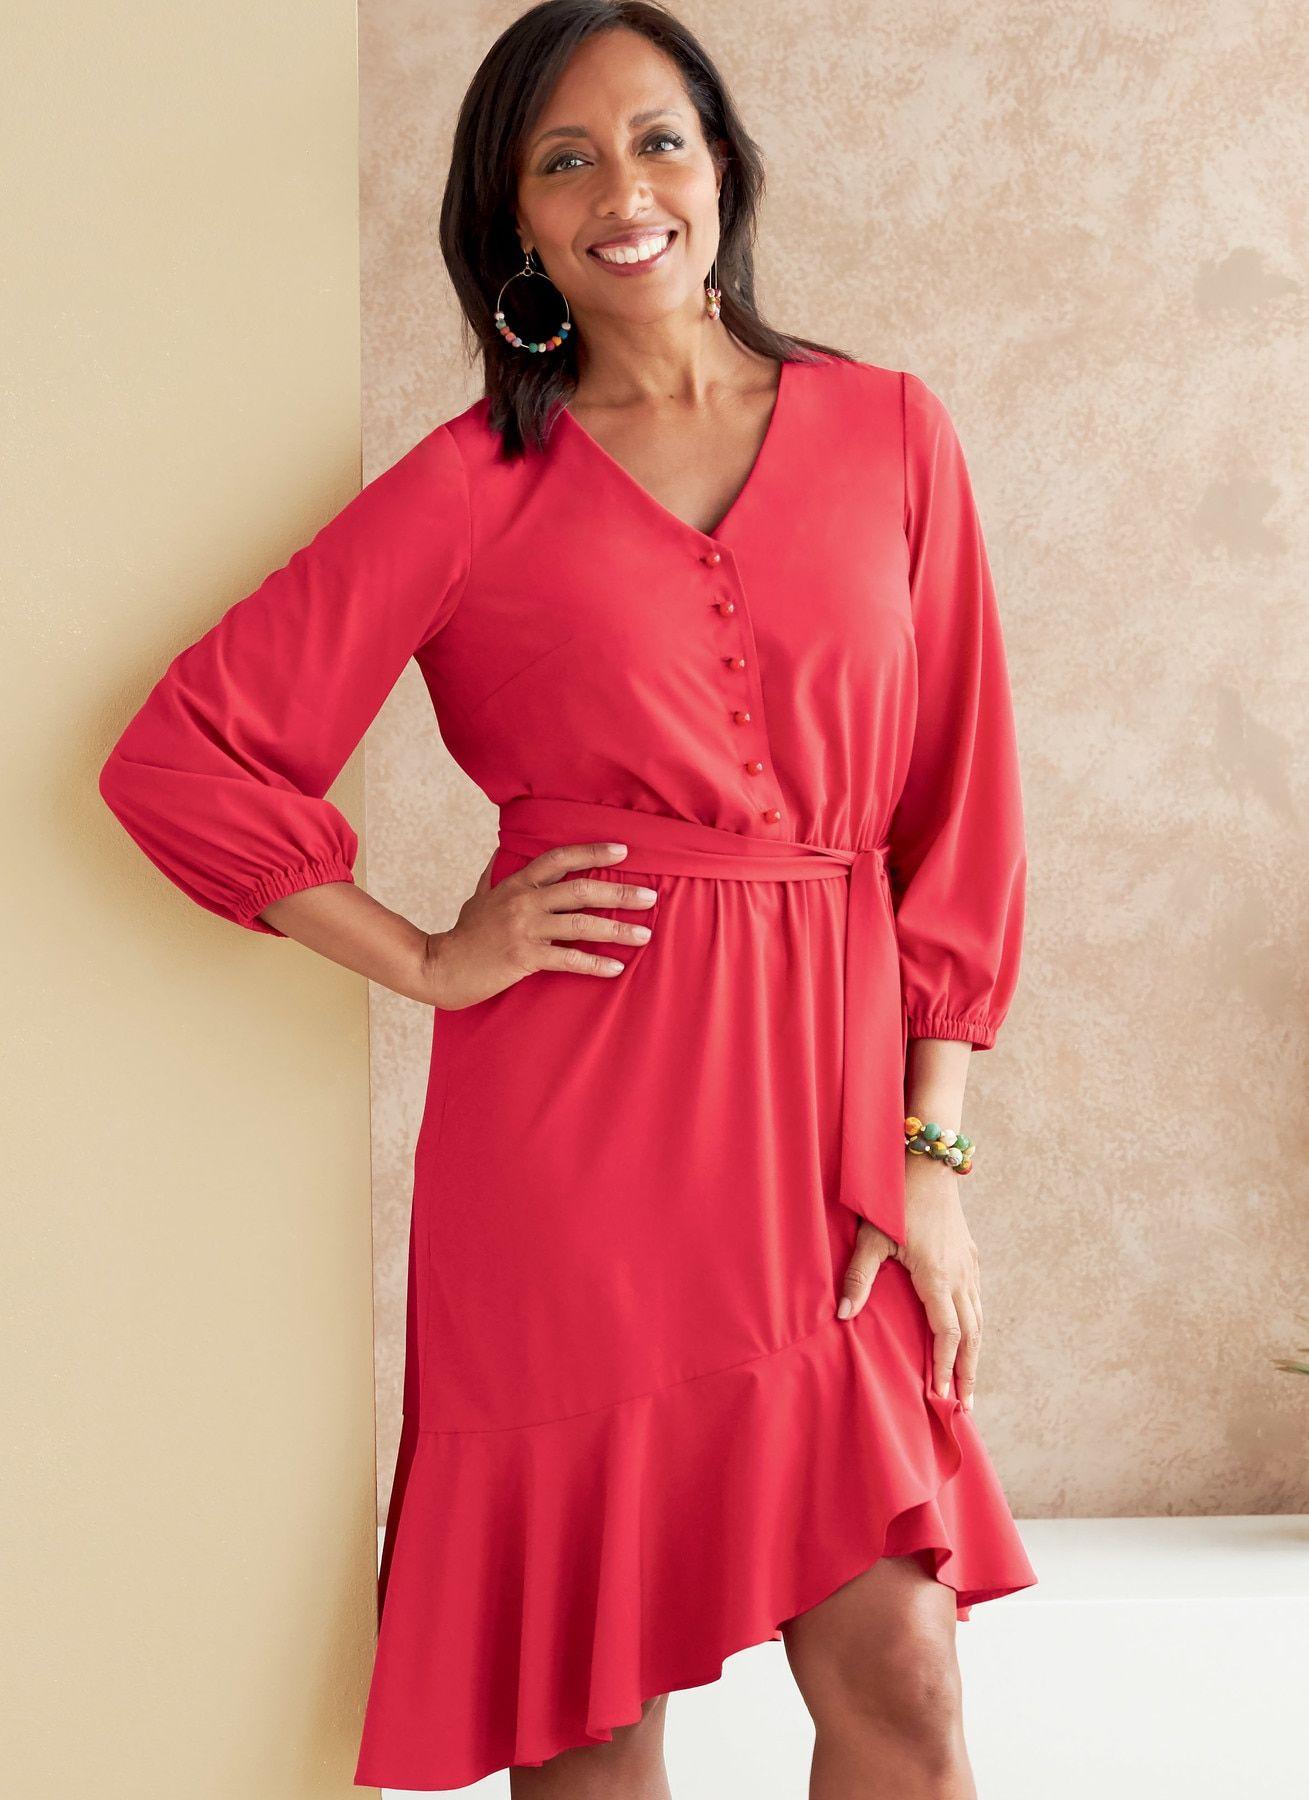 Mango knotted wrap dress - ohhh yes! | Latest fashion clothes, Dresses, Wrap dress